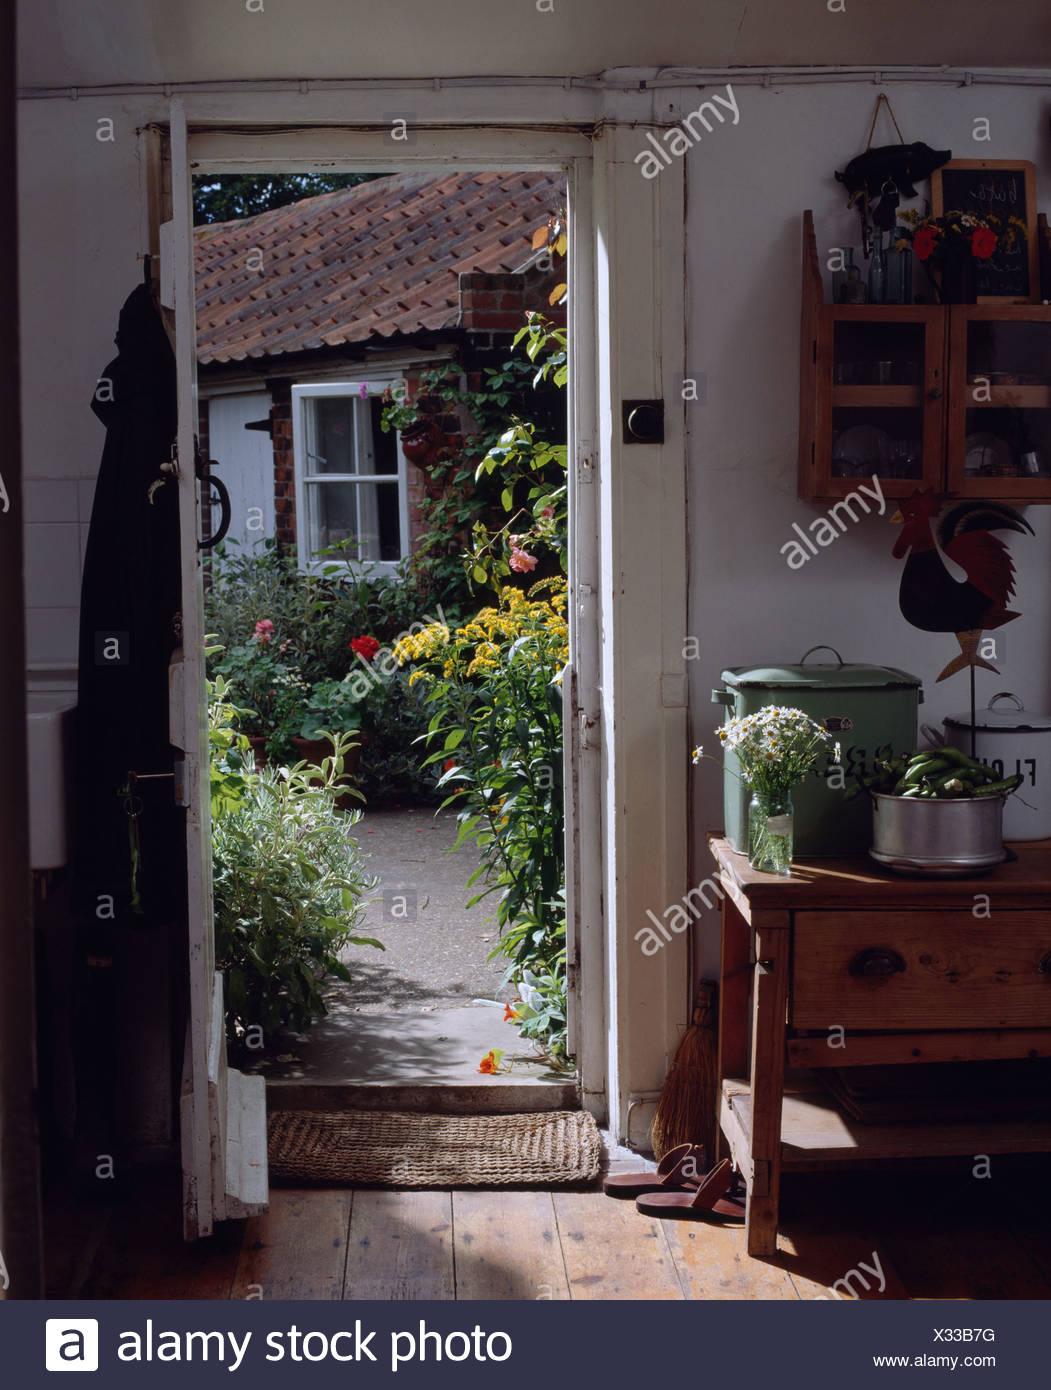 Interiors Kitchens Green Tables Stockfotos & Interiors Kitchens ...